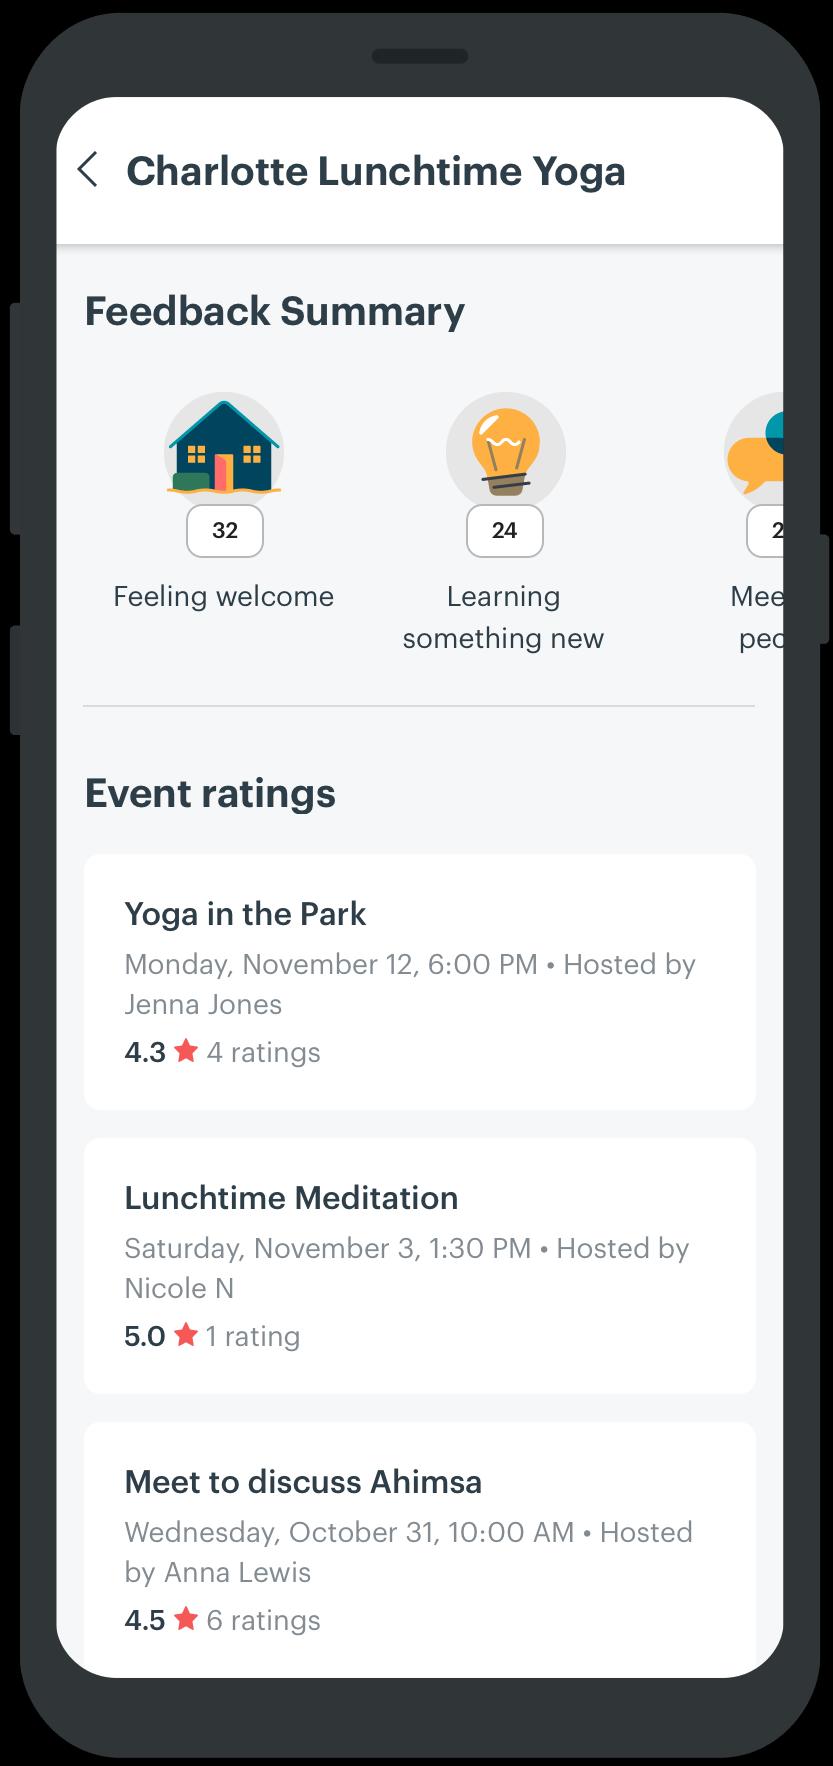 feedback-summary_viewing-event-feedback.png